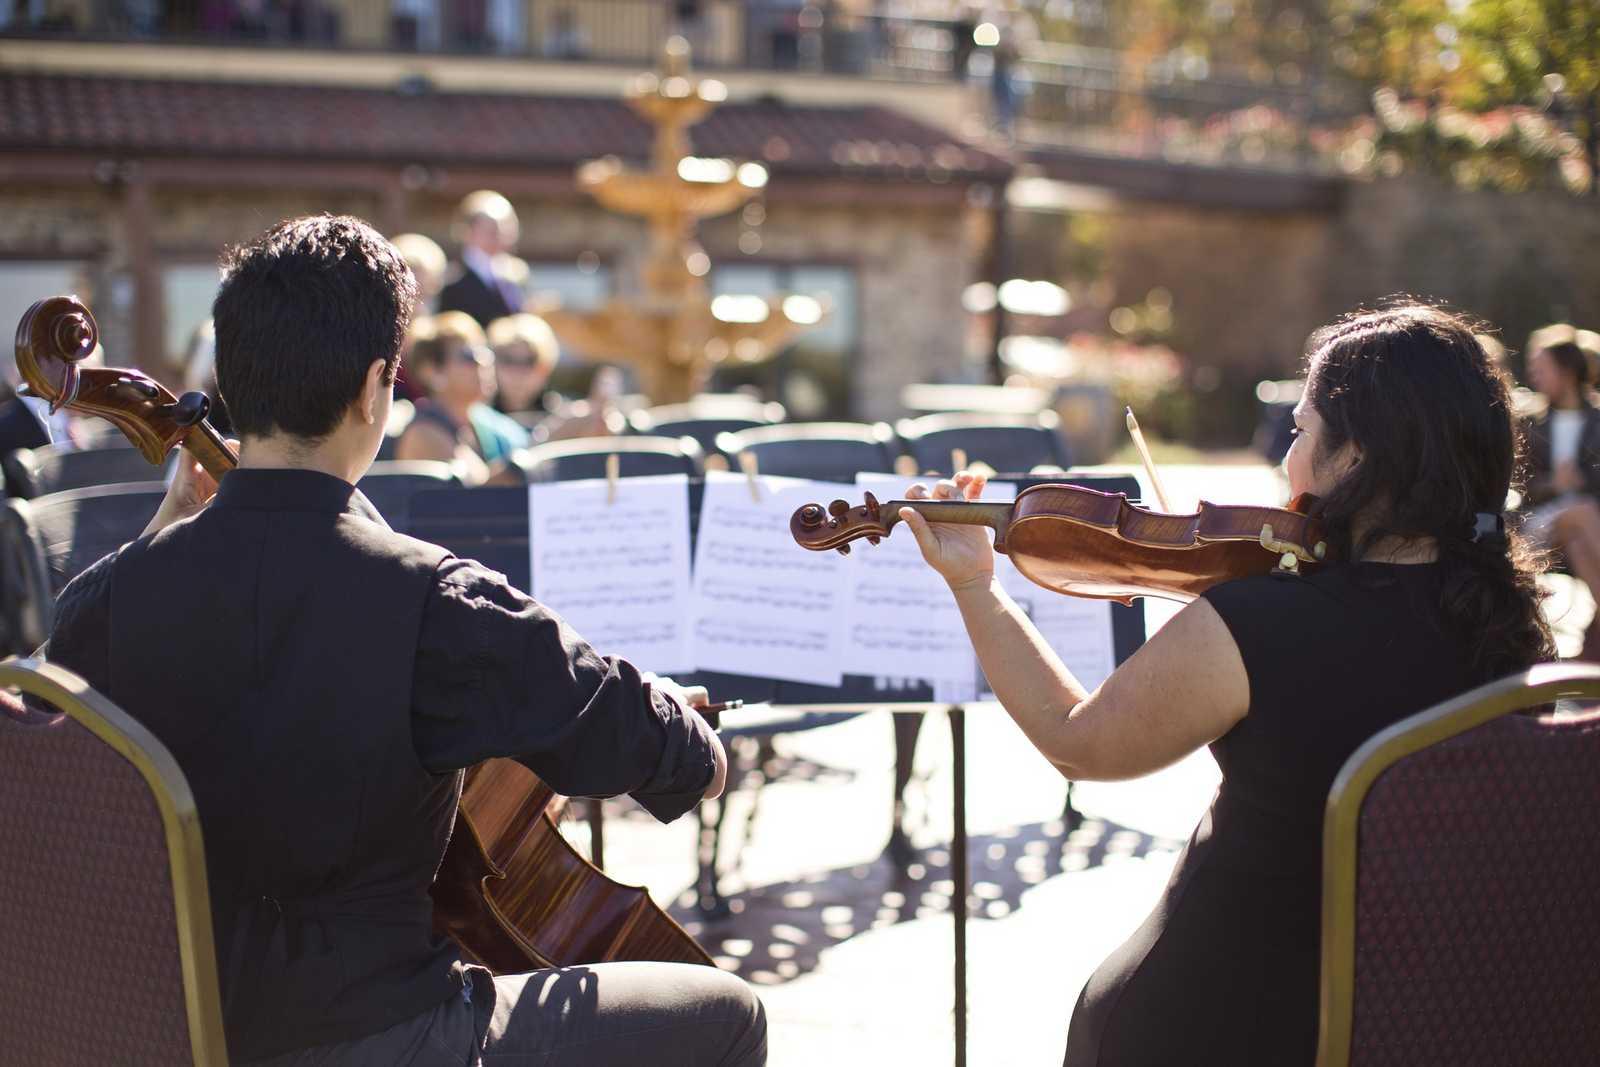 donrosenberg-musicians-vineyard-event-2072922-1600x